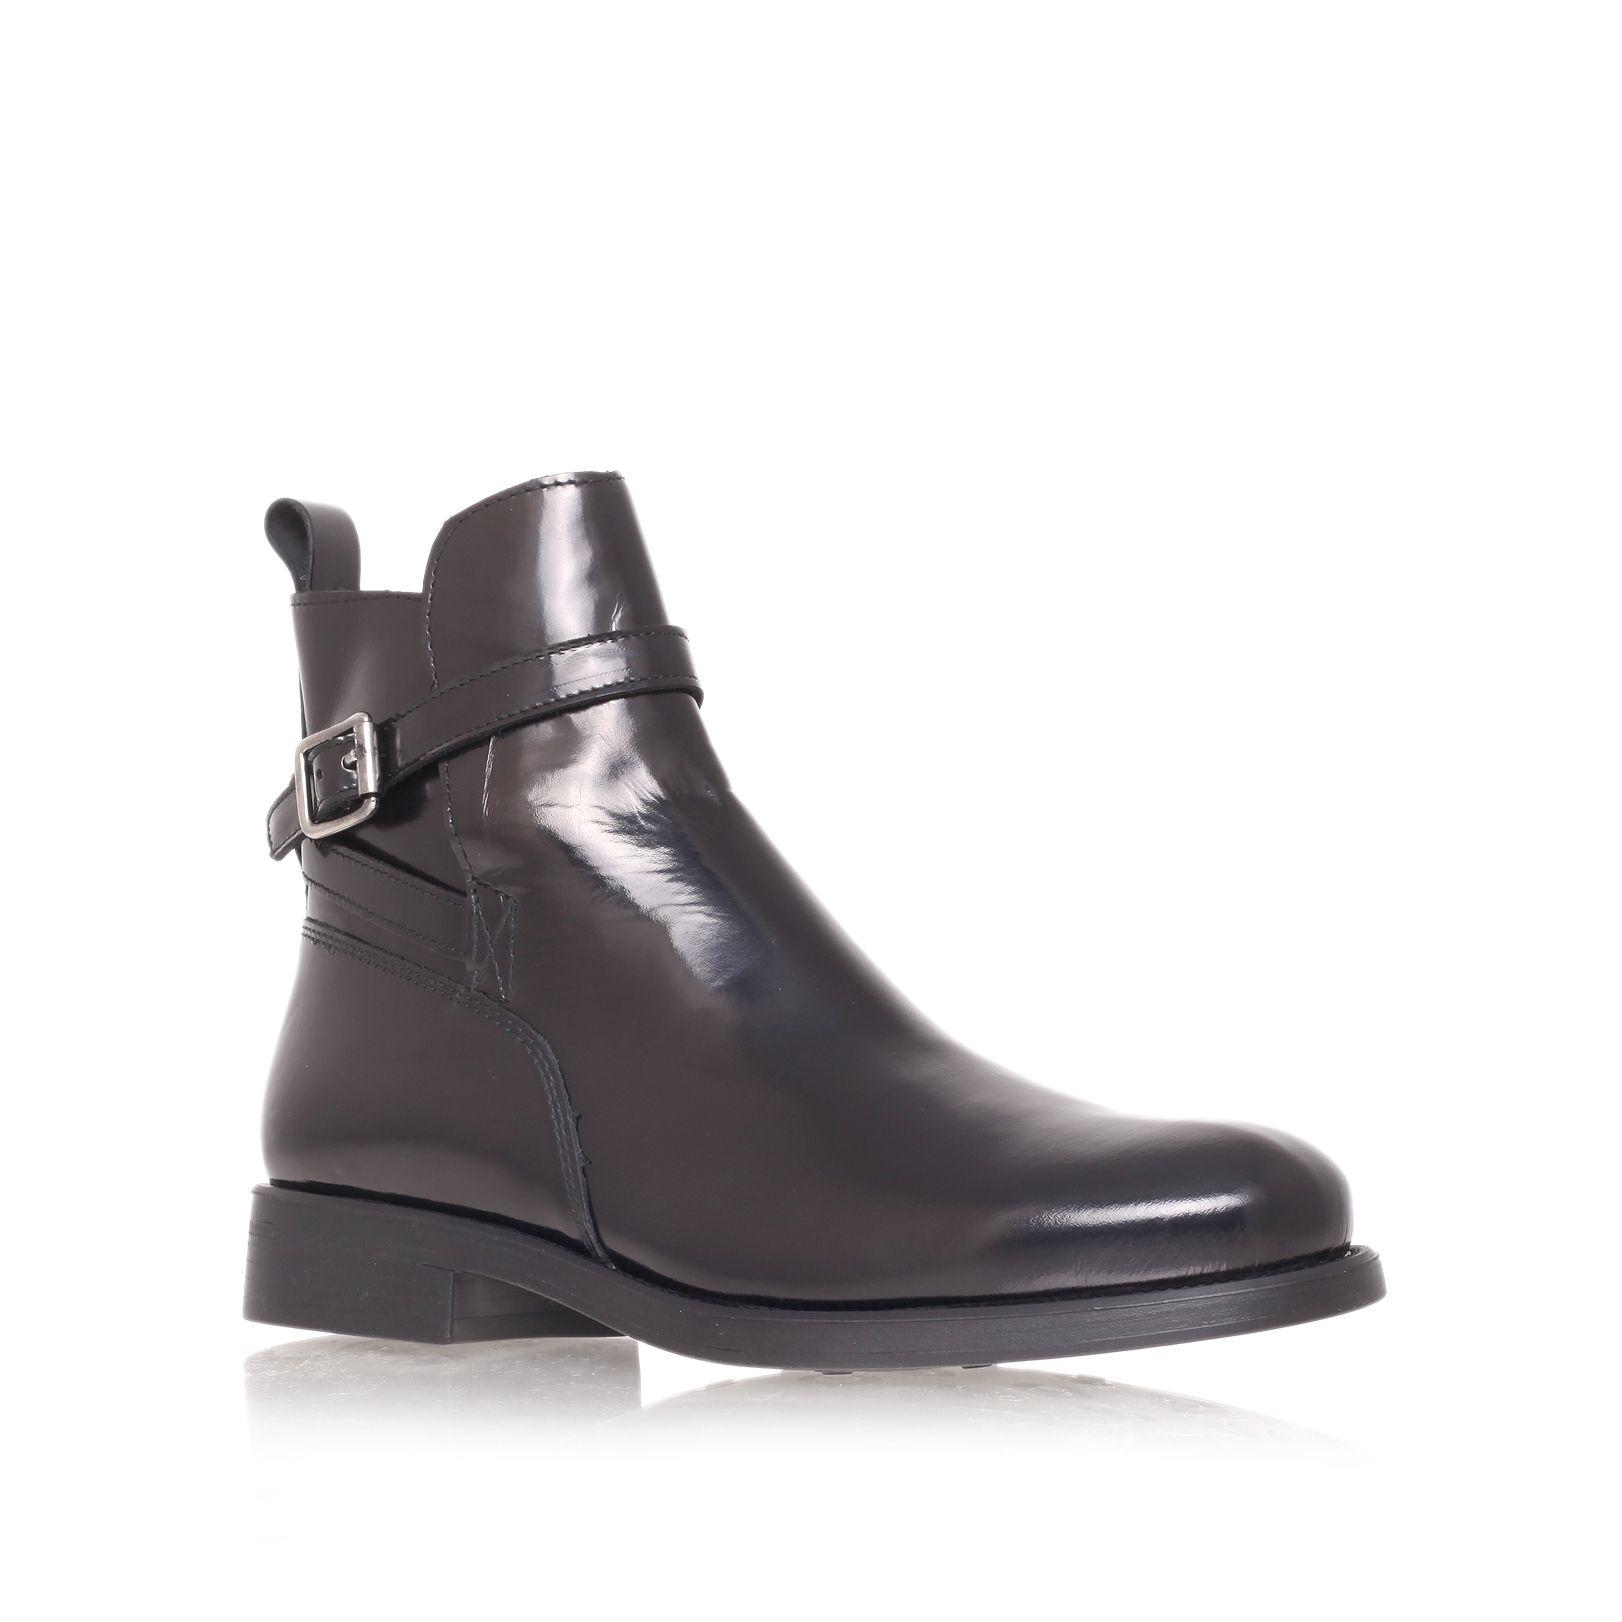 Kurt Geiger Sutherland Ankle Boots In Black For Men Lyst